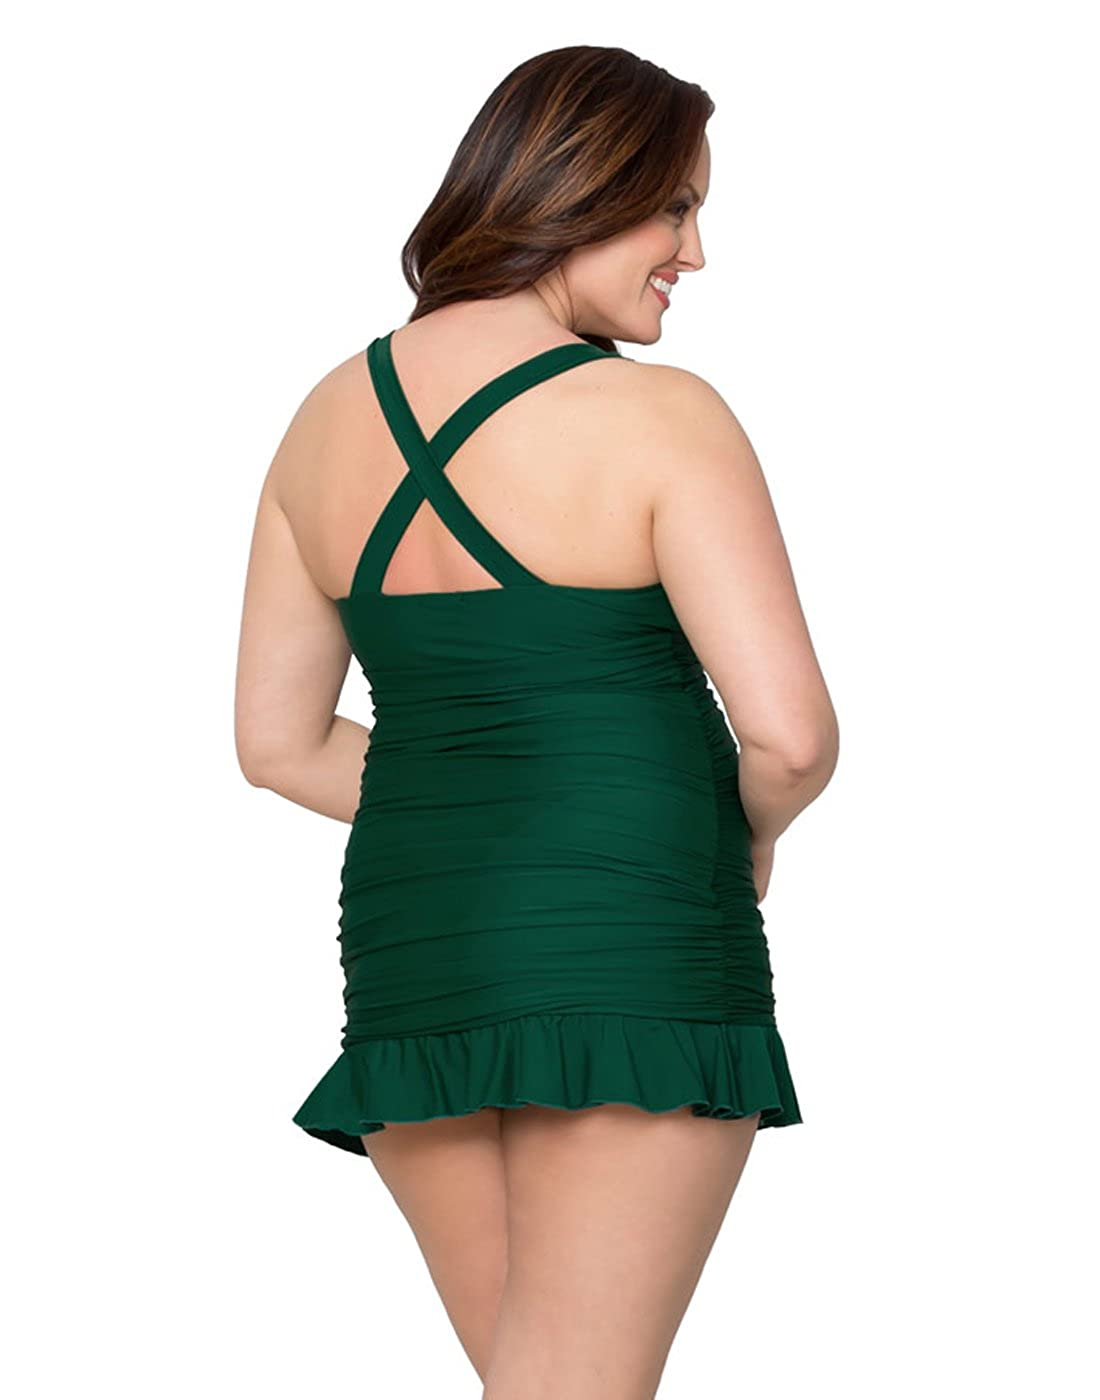 f9739c5e88b Kiyonna Women s Plus Size Kelly Swimsuit 0X Emerald at Amazon Women s  Clothing store  Fashion One Piece Swimsuits